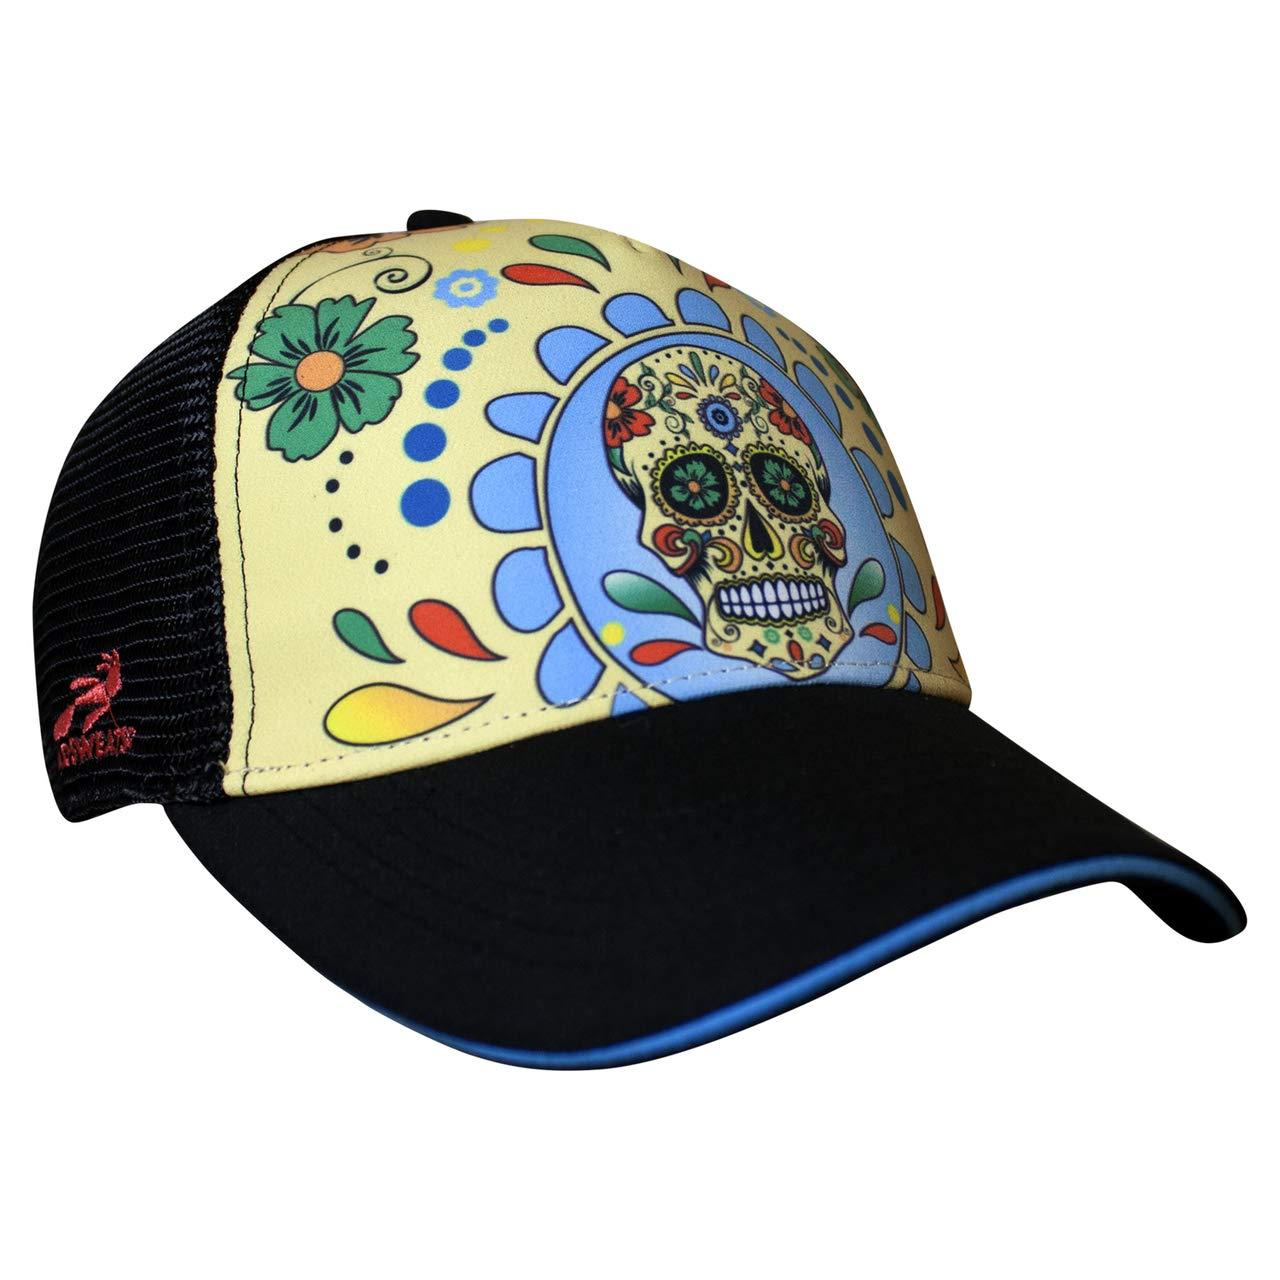 e265f6aa71f Amazon.com  Headsweats Performance Trucker Hat